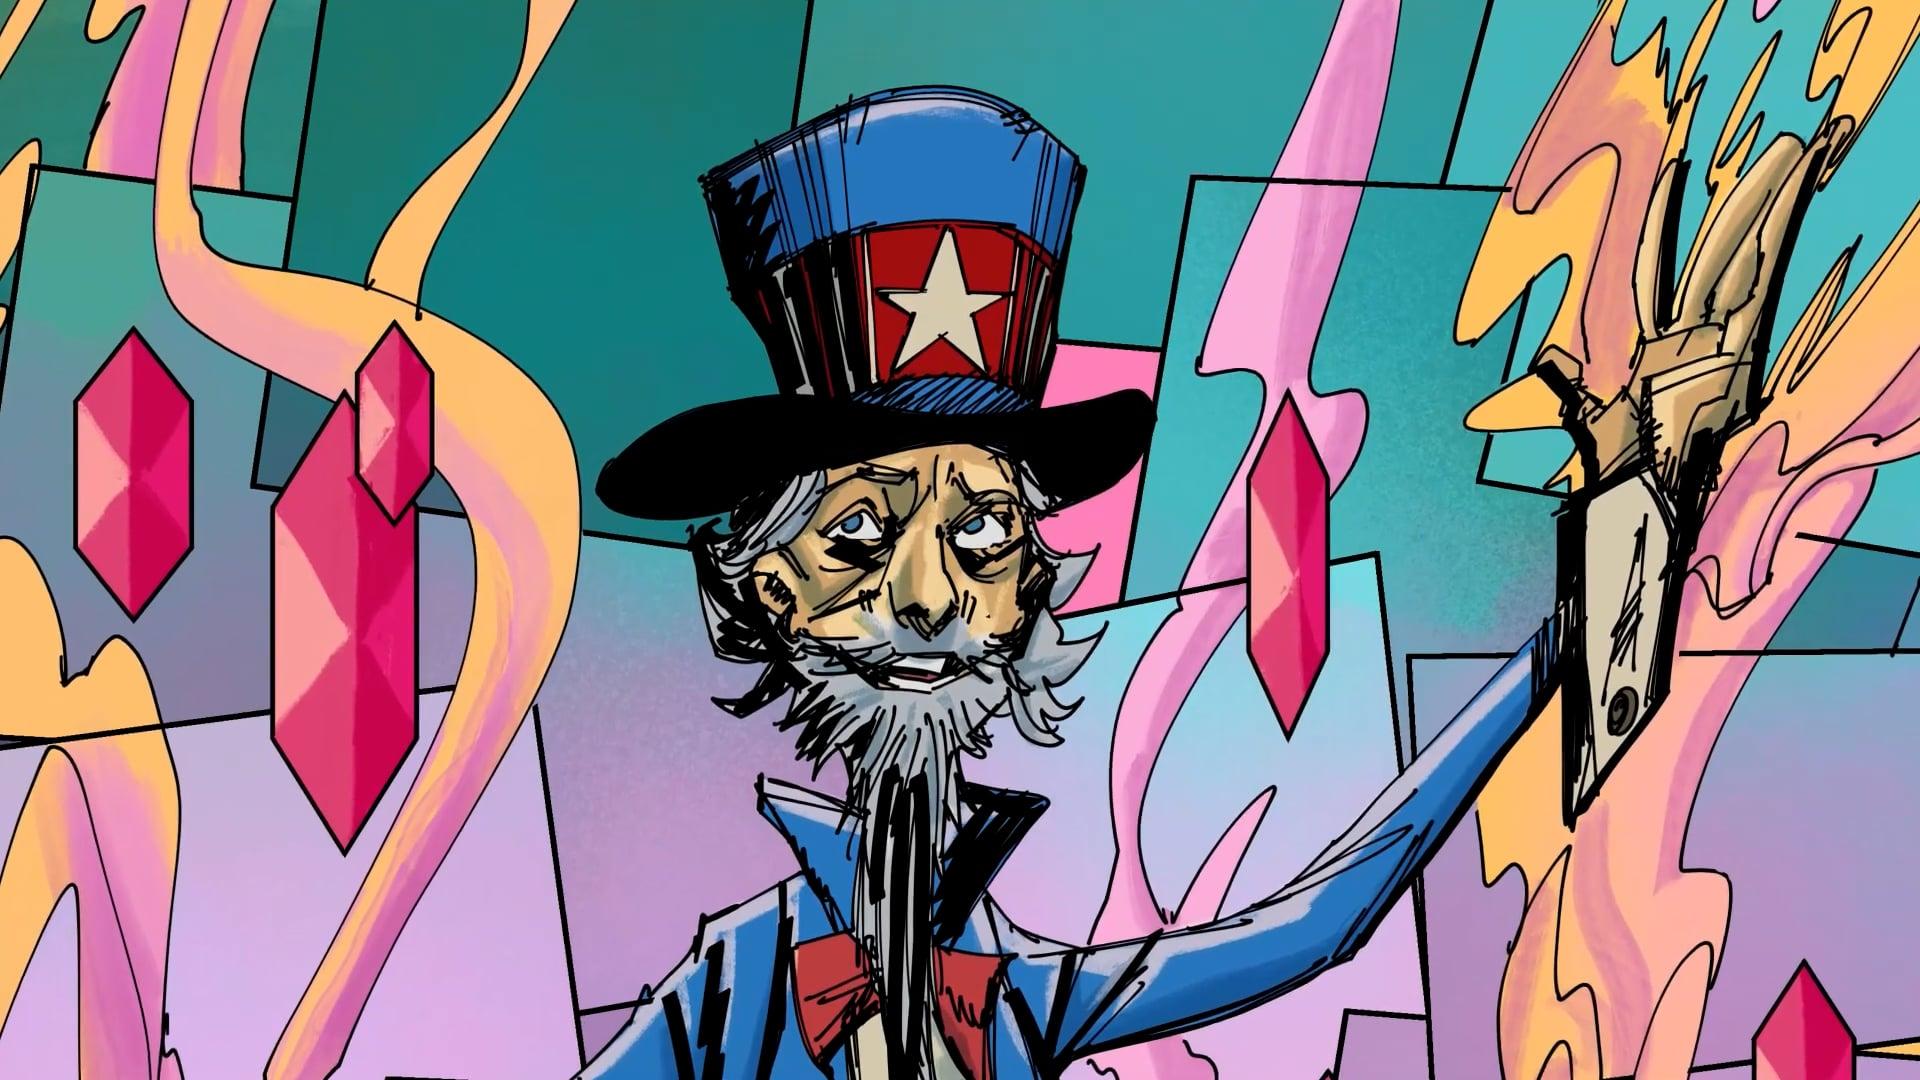 Superstate – Uncle Sam (feat Graham Coxon & Rahel Debebe-Dessalegne)